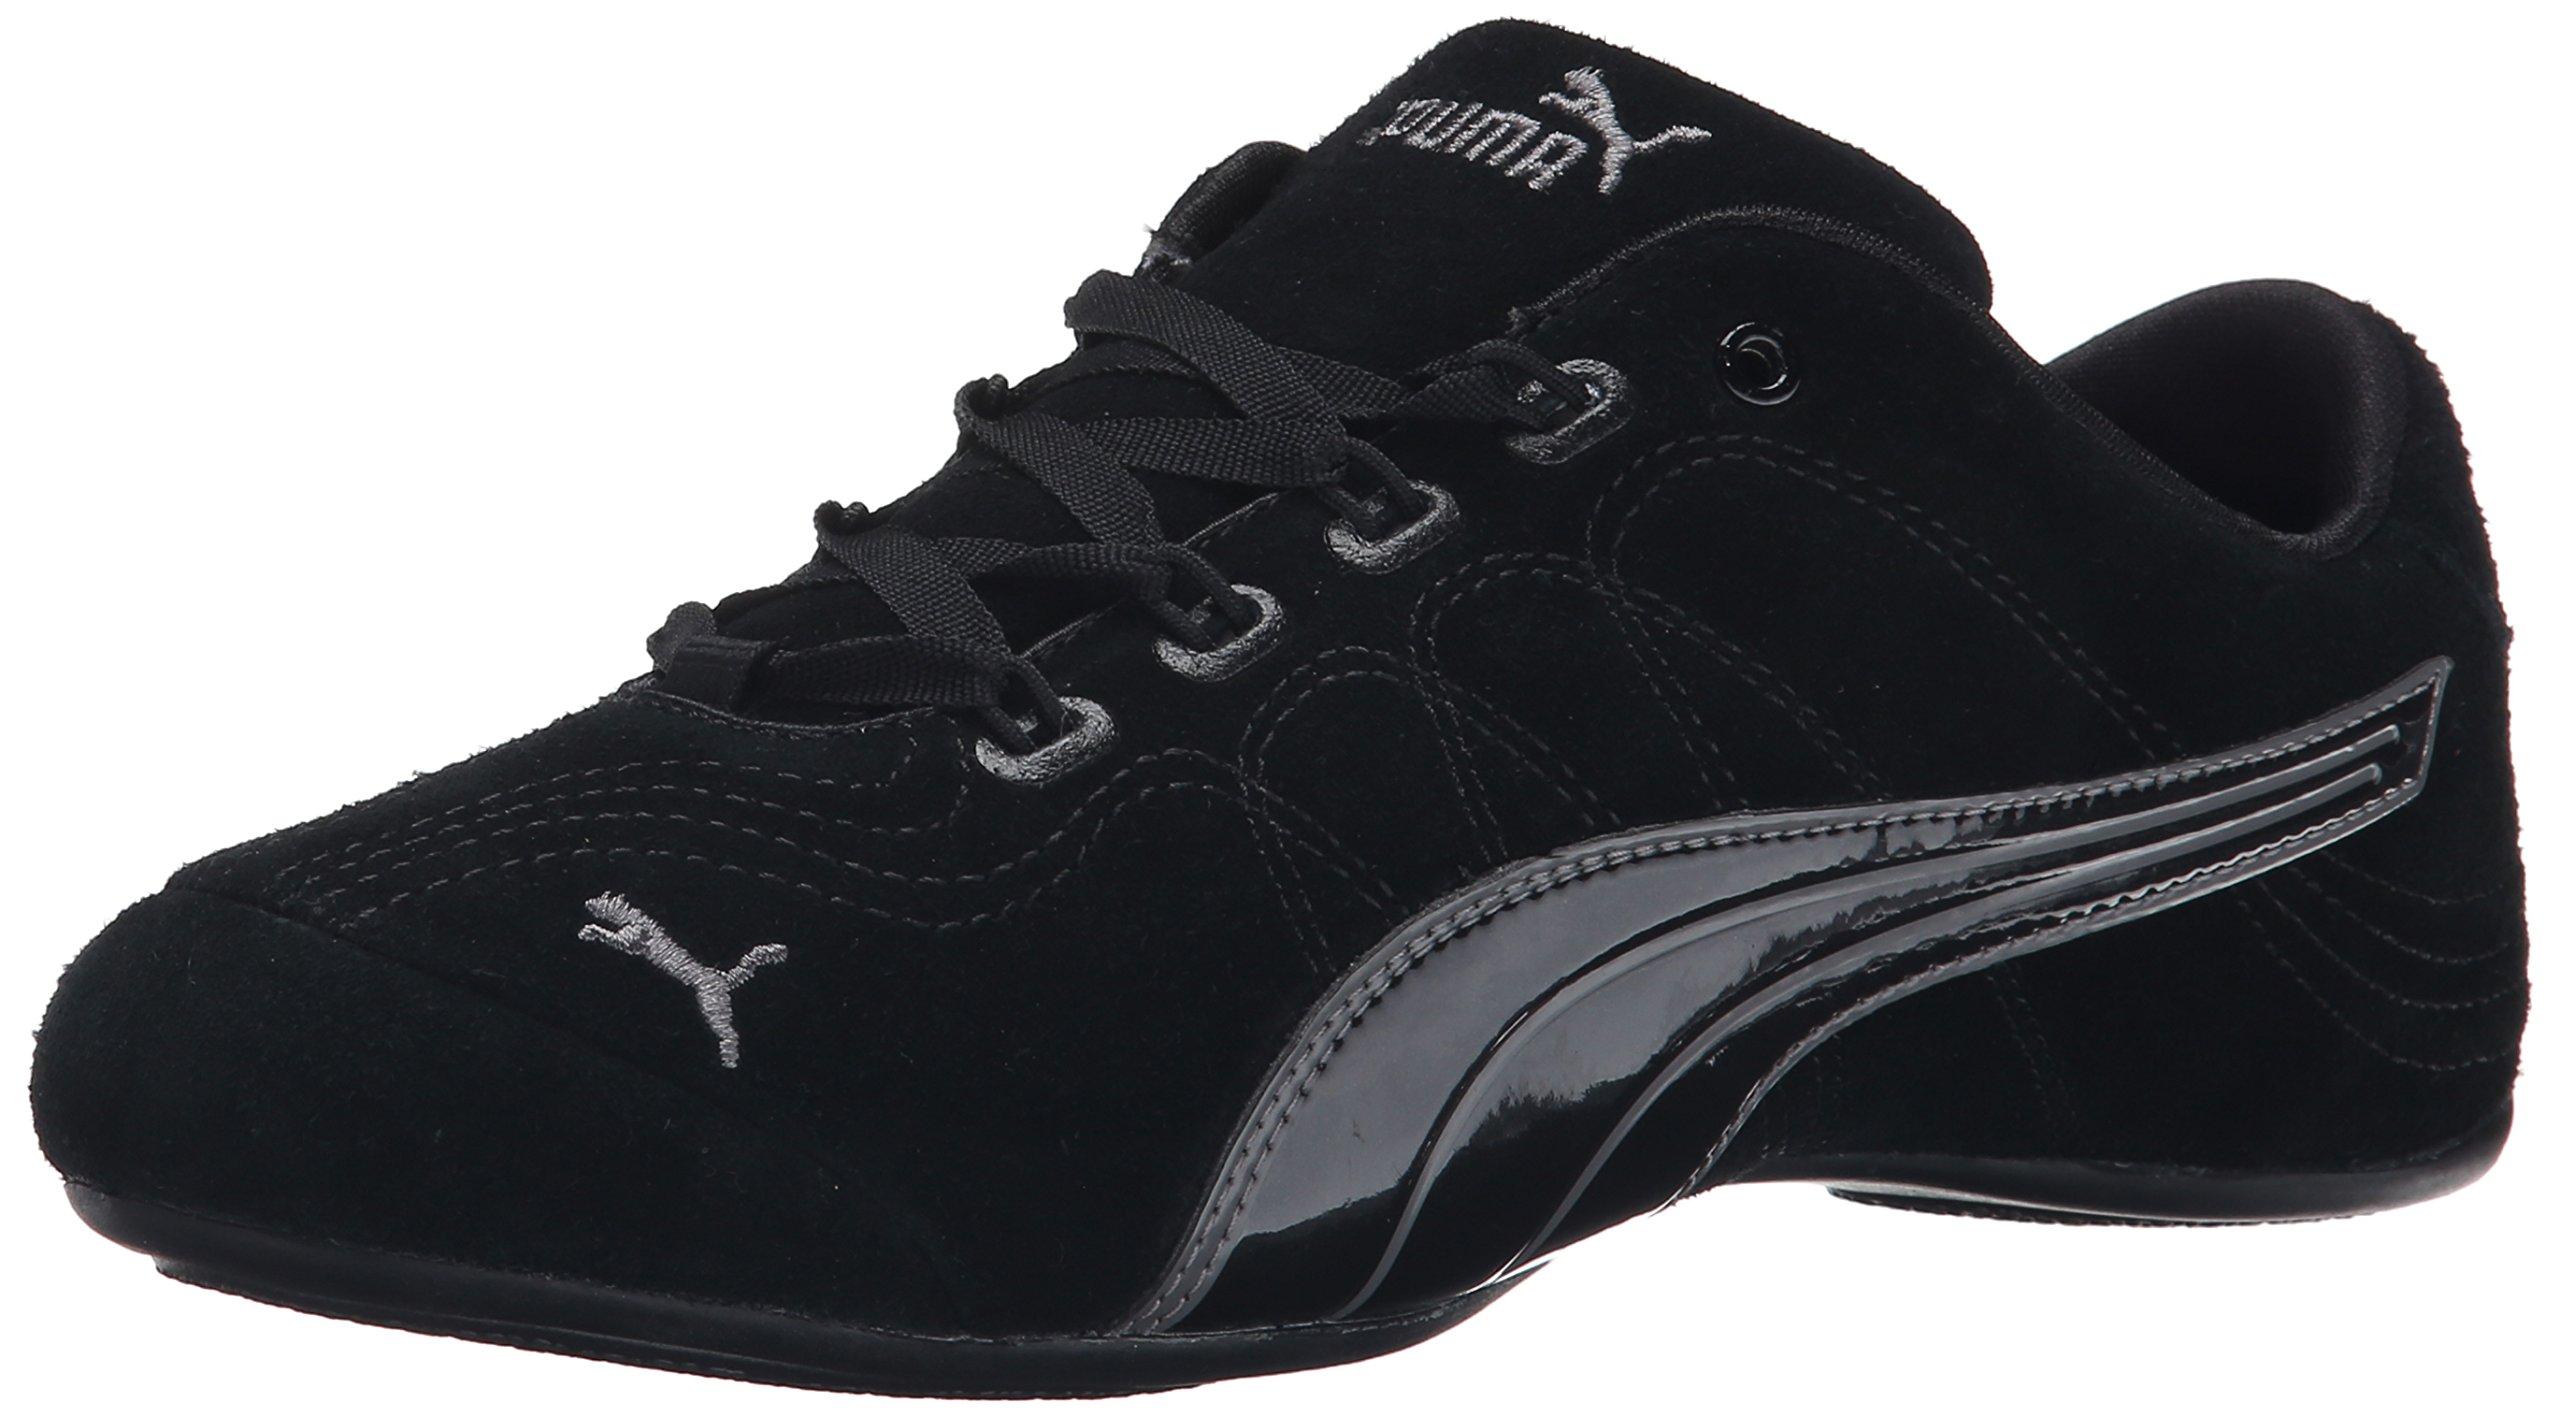 PUMA Women's Soleil V2 Suede Patent Sneaker, Black/Steel Gray, 7 B US